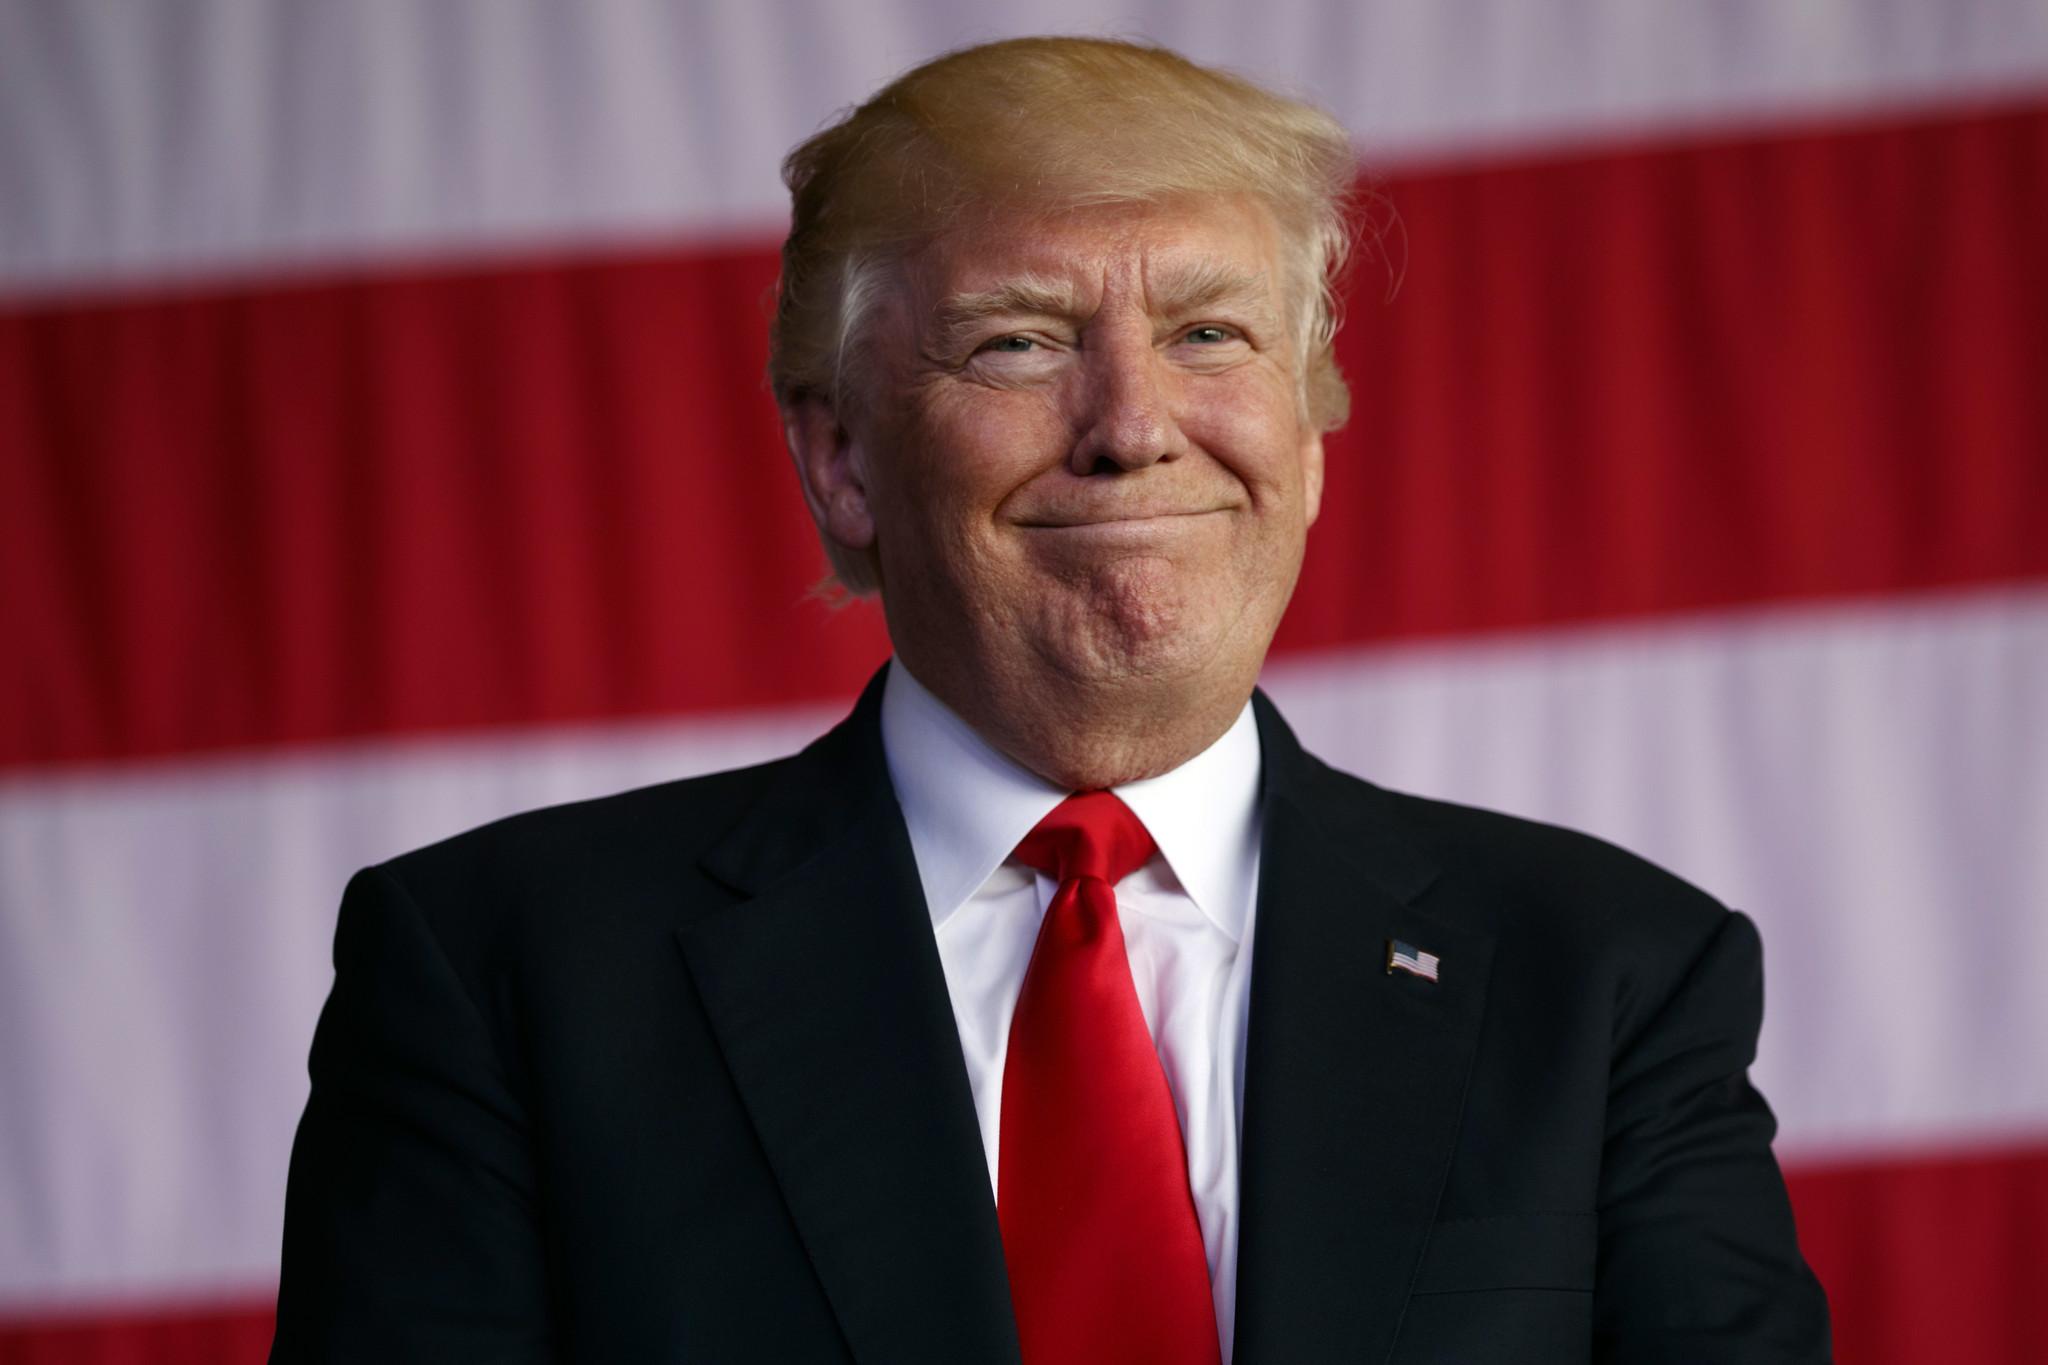 ct-donald-trump-stupid-president-20170531.jpg